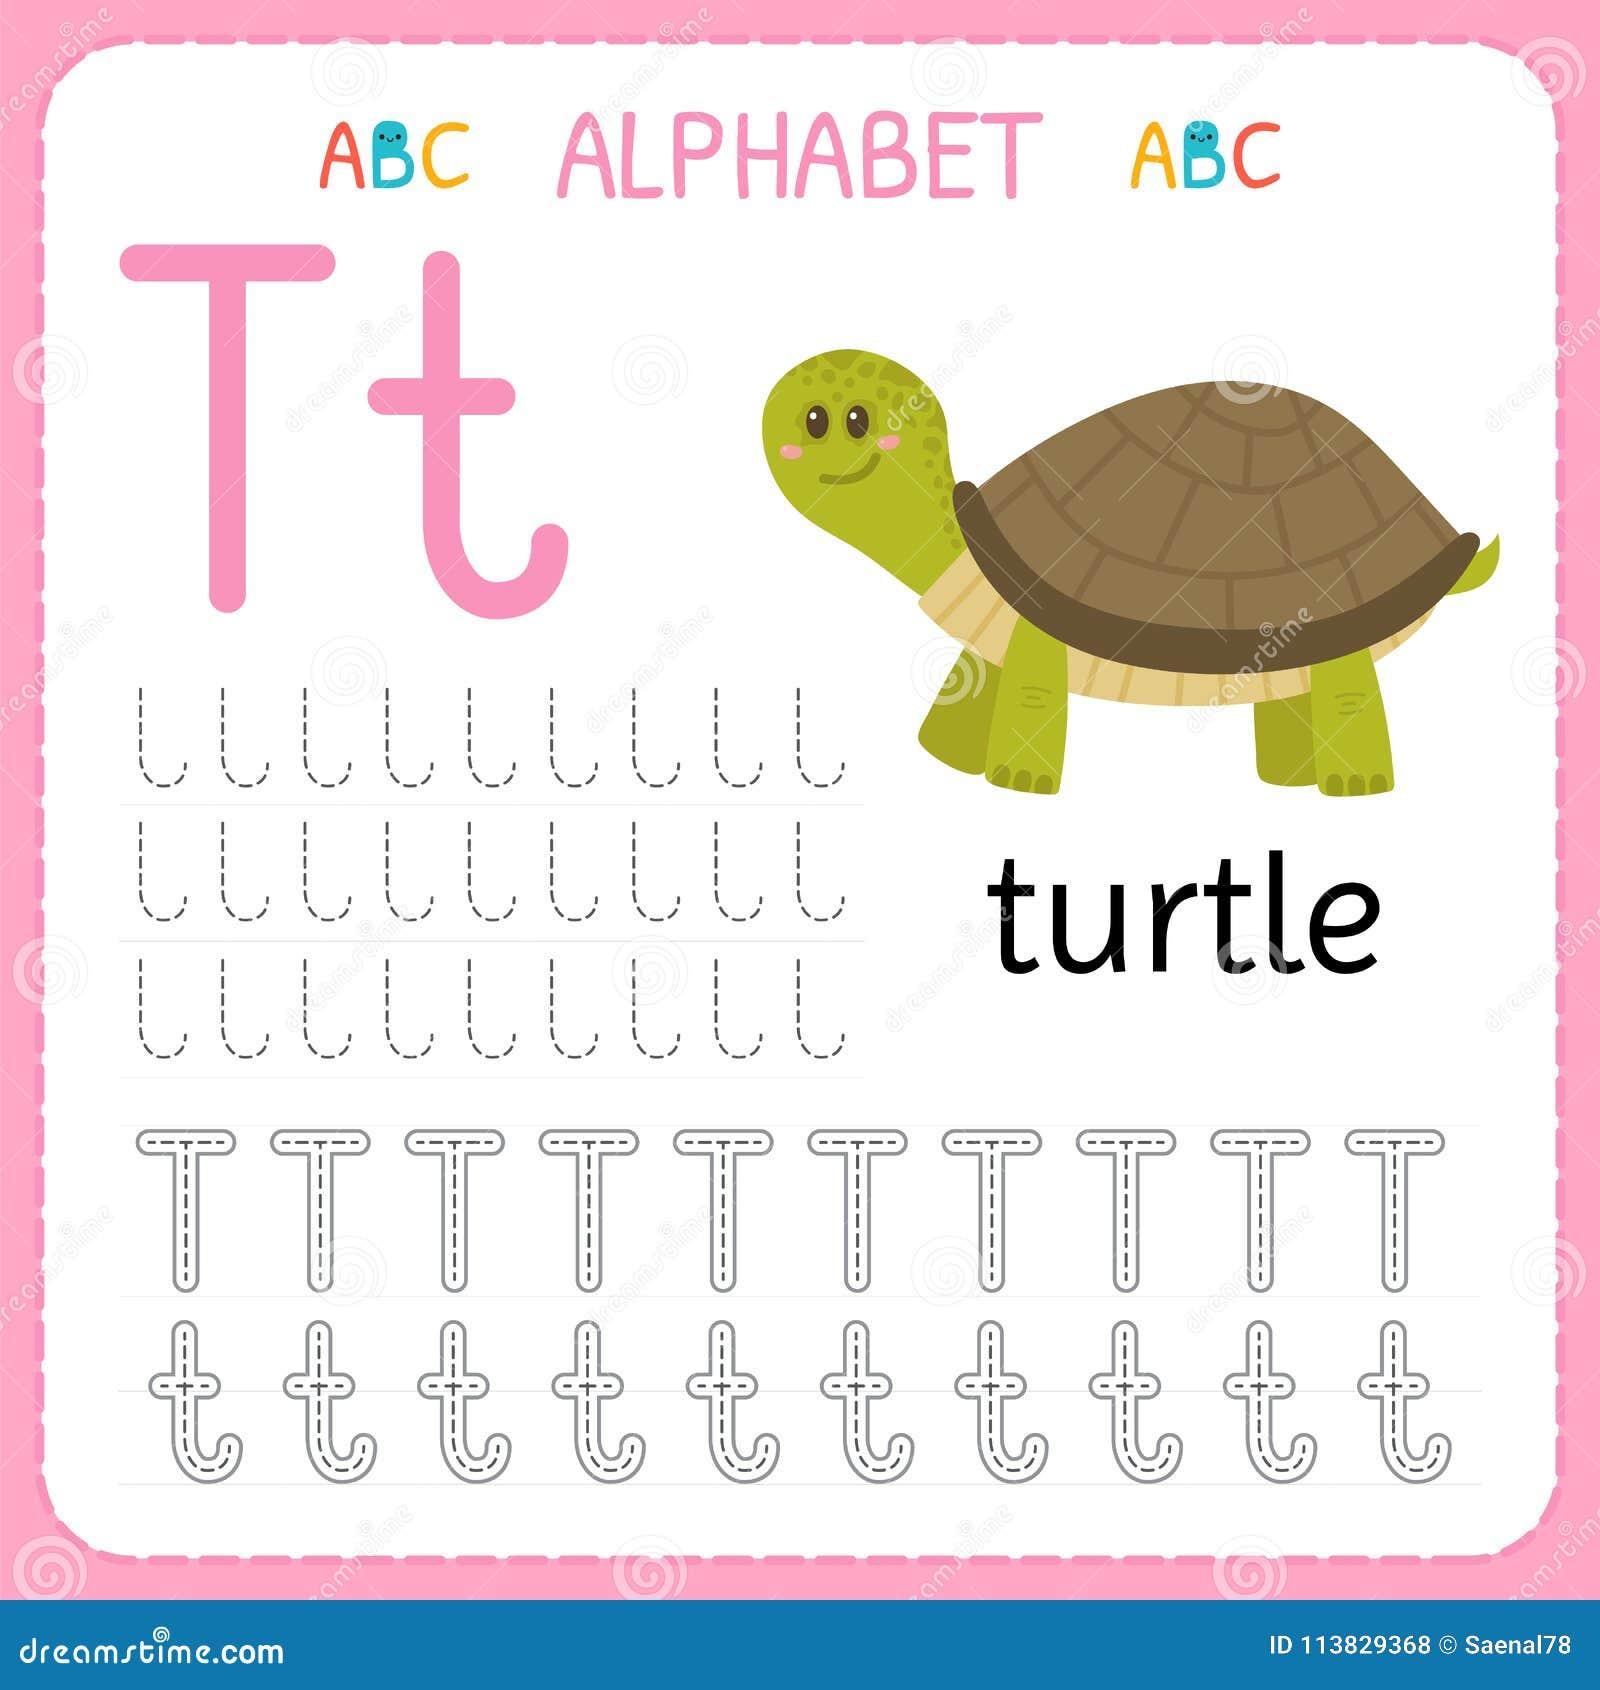 alphabet tracing worksheet for preschool and kindergarten writing practice letter t exercises. Black Bedroom Furniture Sets. Home Design Ideas